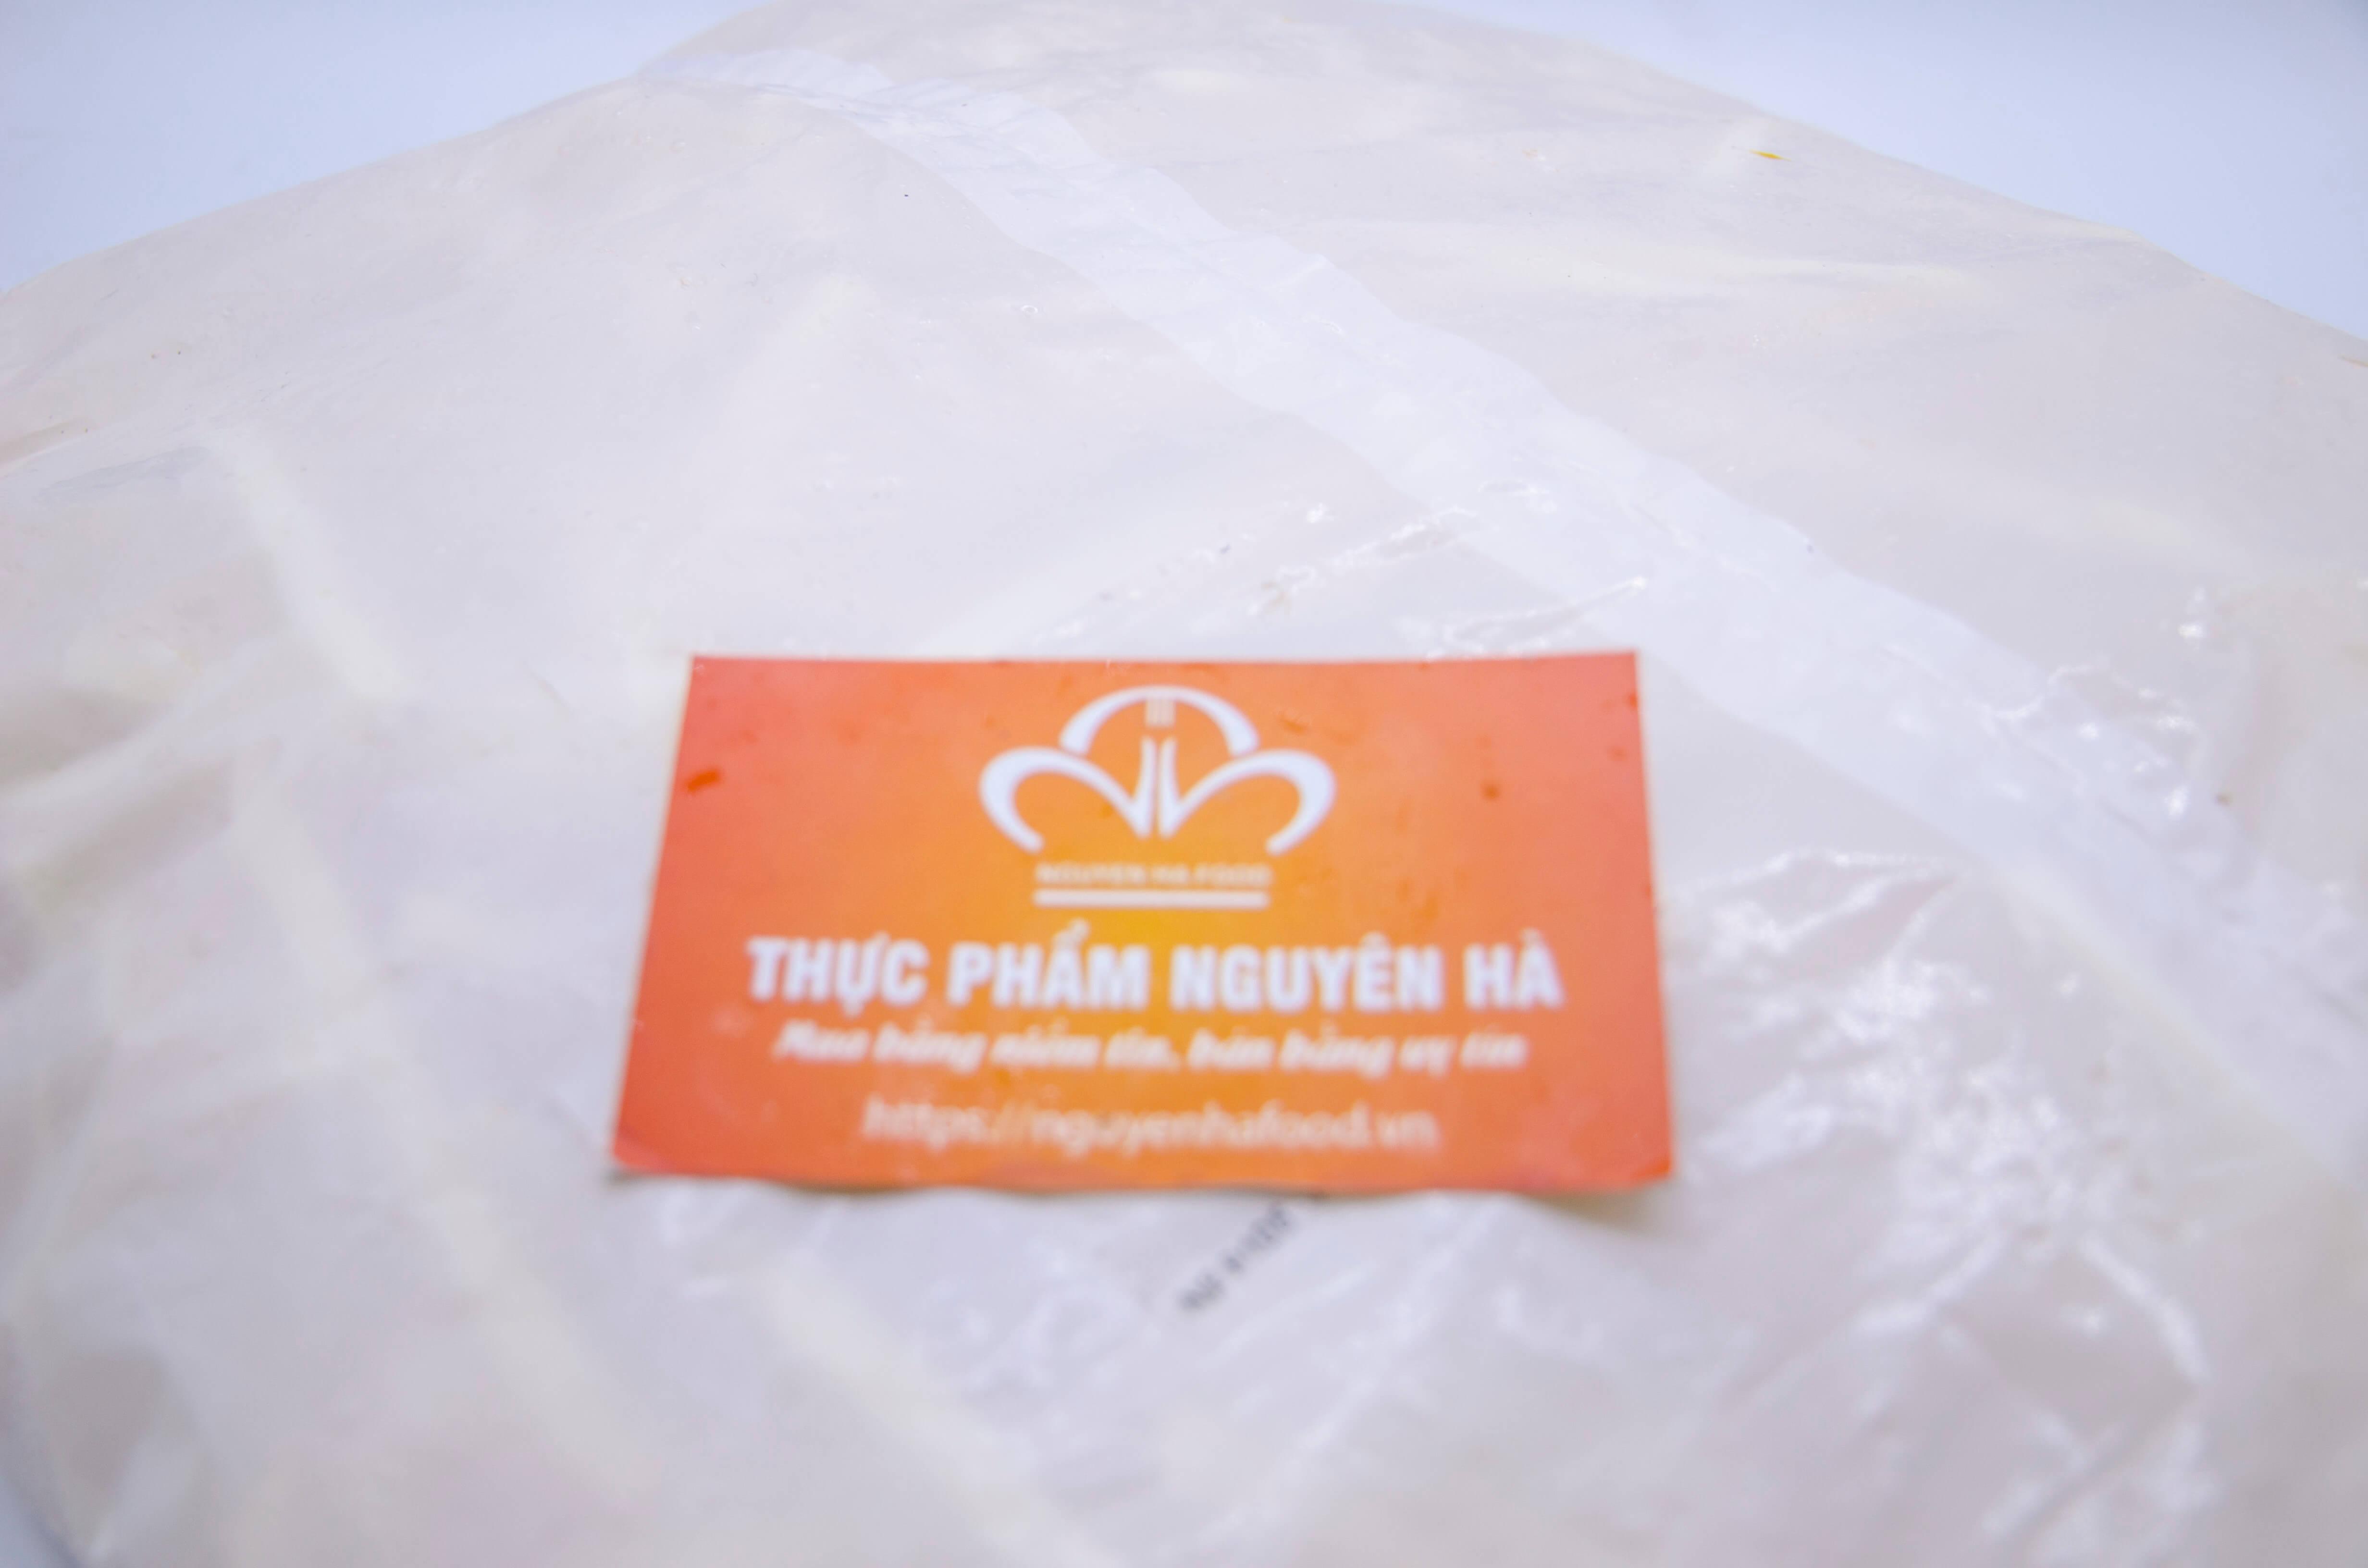 Khoai tây  McCain Cọng nhỏ 1/4 (~6mm) - McCain Shoestring Fries 1/4 (~6mm) – 3kg/bao